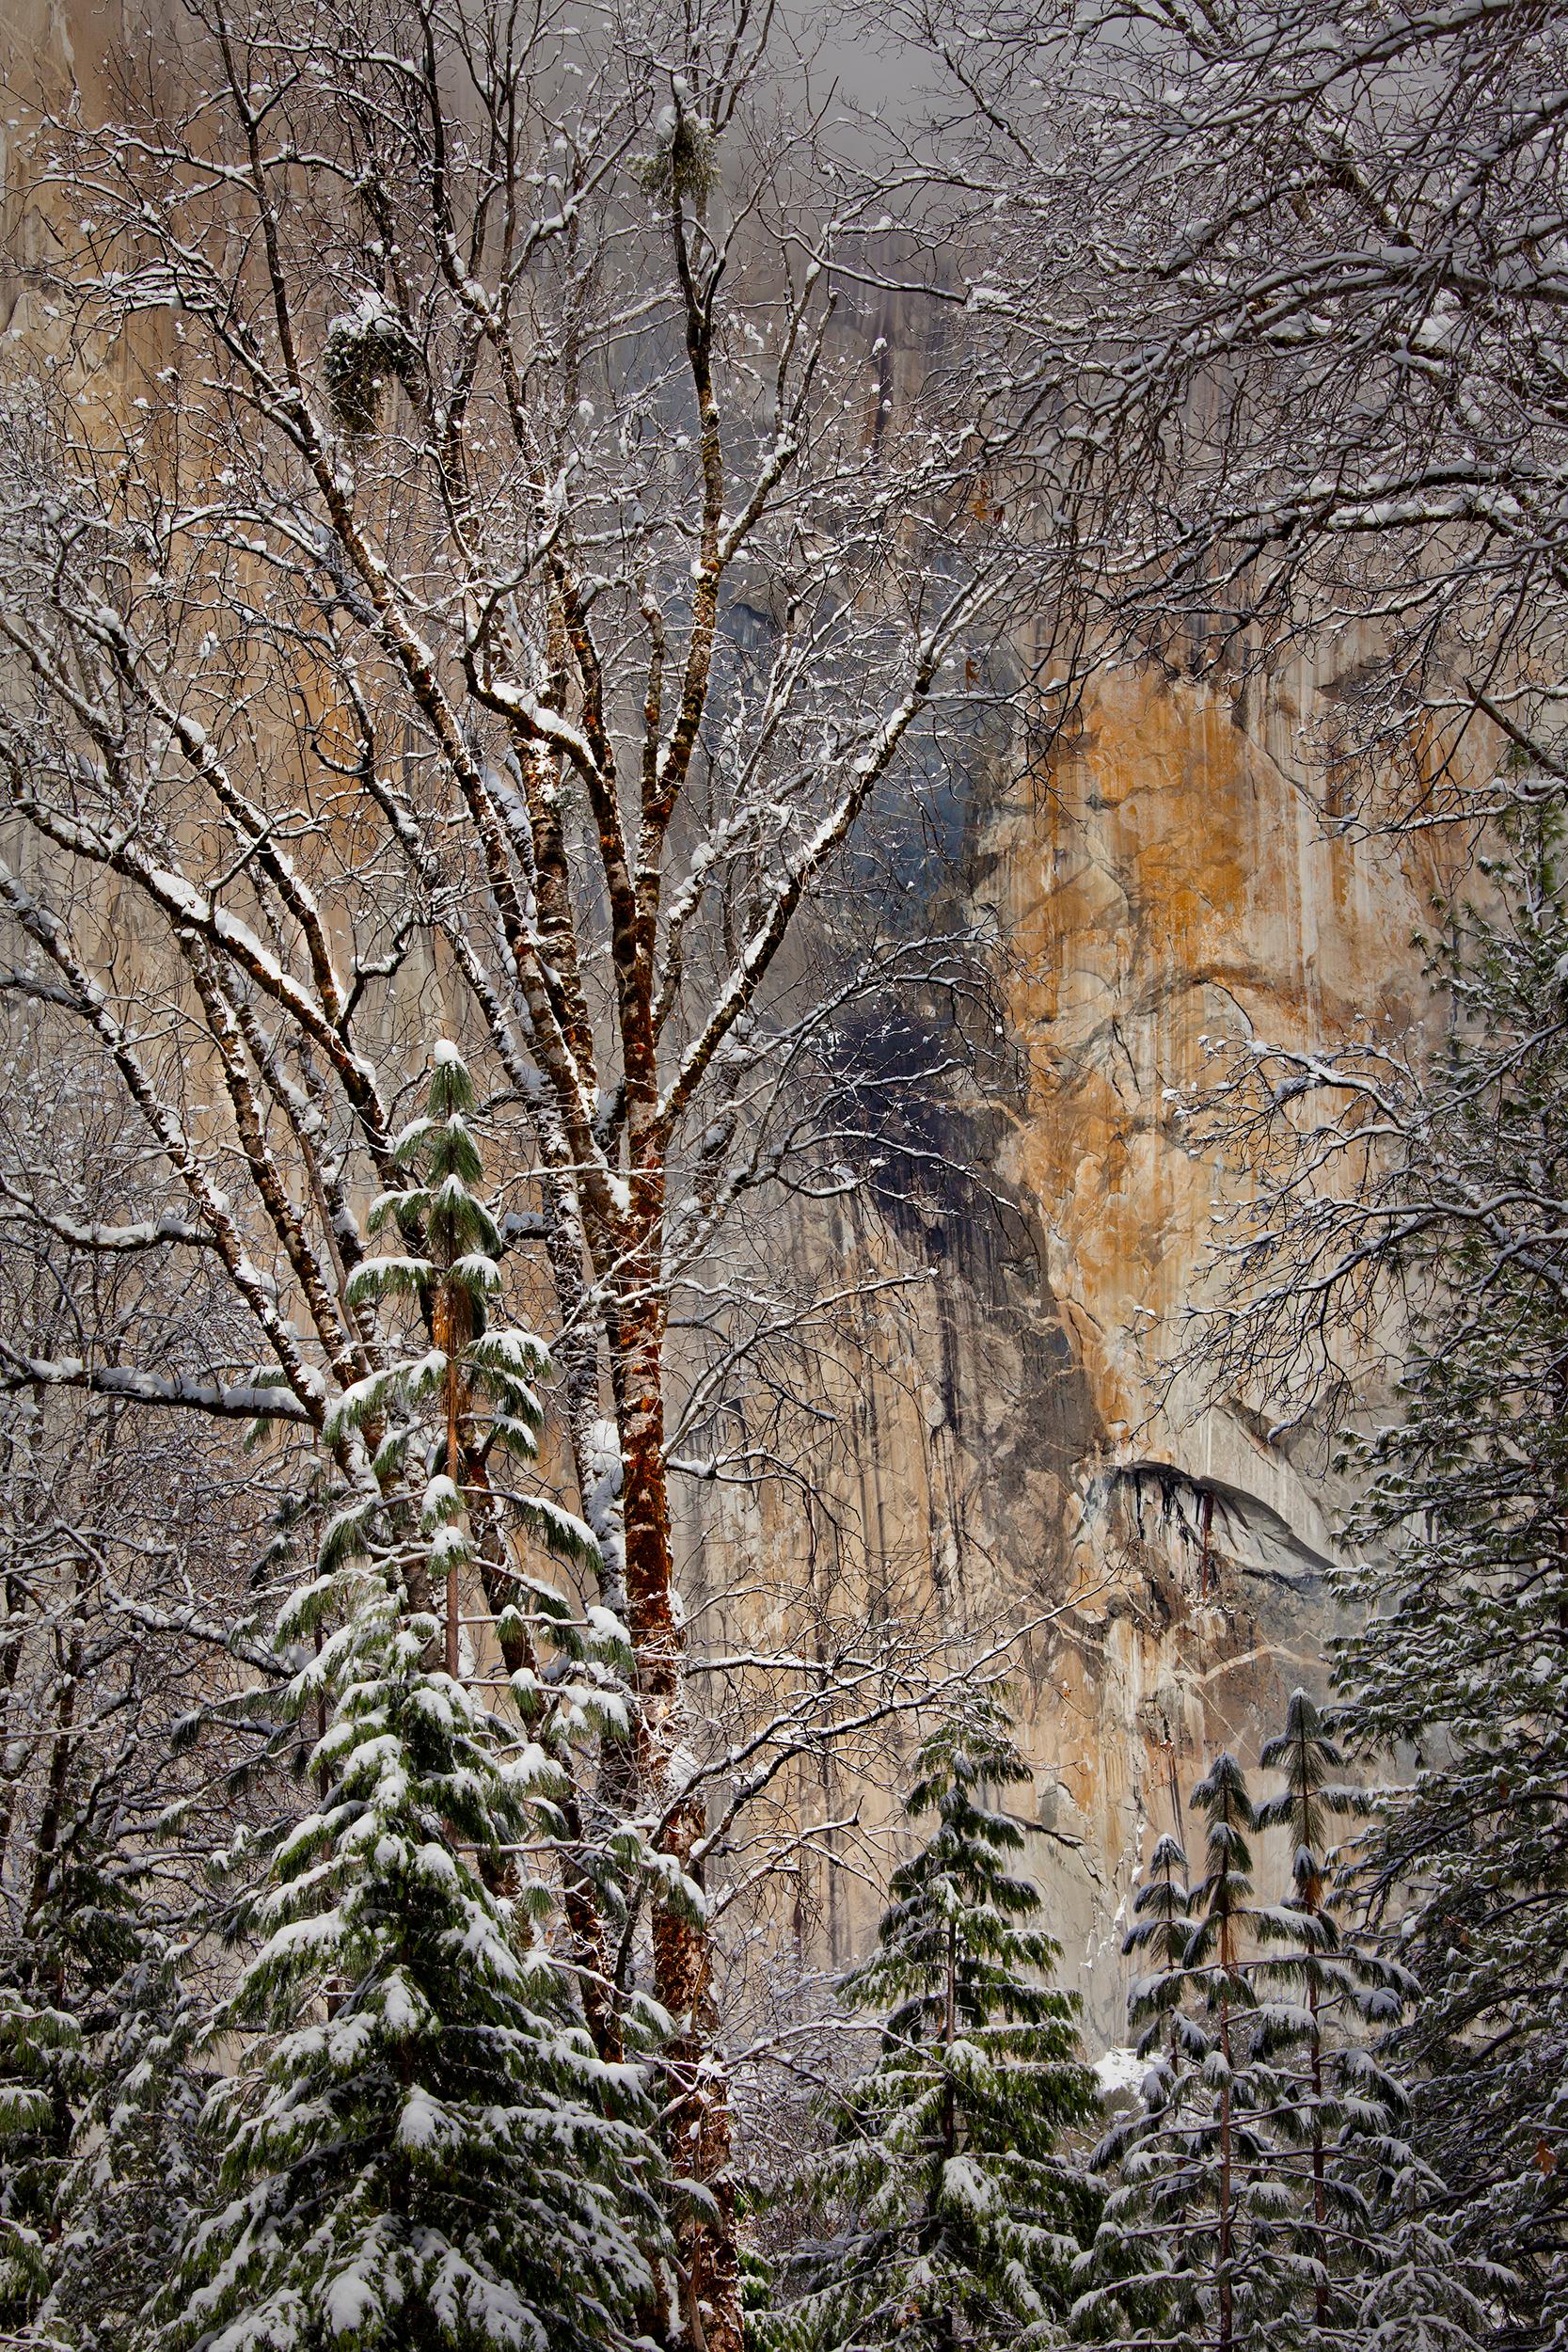 El Capitan Through the Trees in Winter (9732)